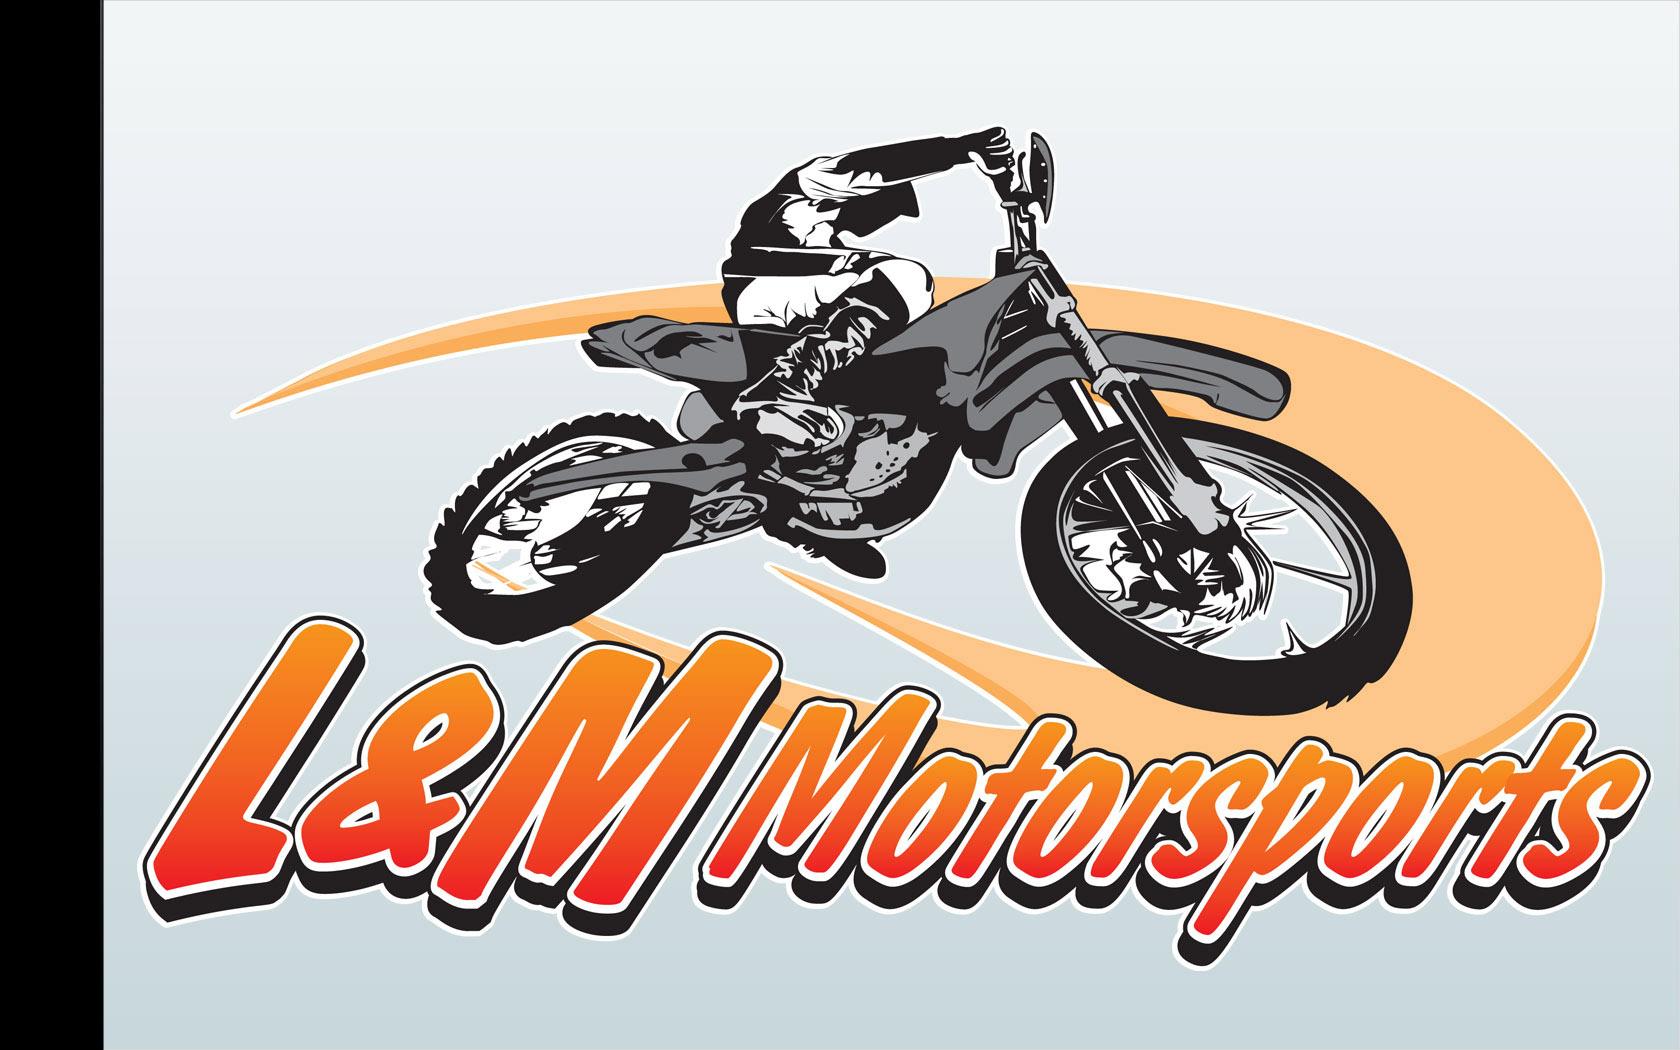 LMMotorsports_1680x1050.jpg